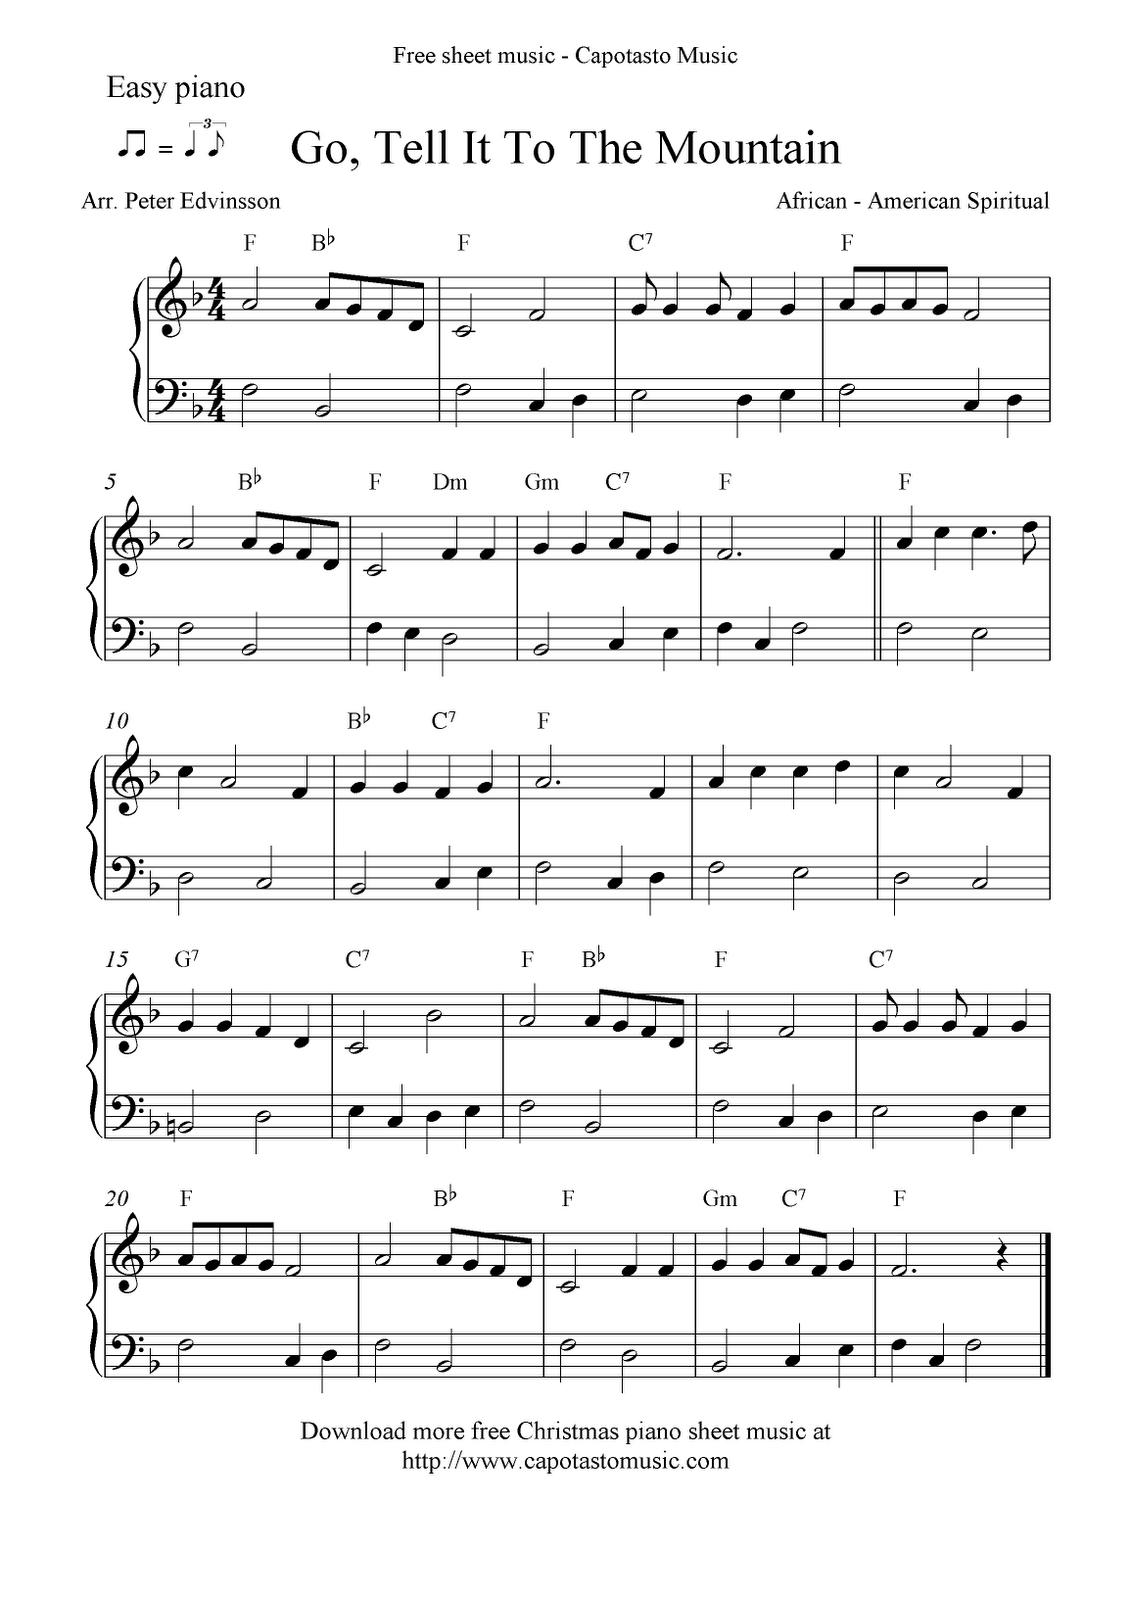 Free Printable Piano Sheet Music   Free Sheet Music Scores: Easy - Christmas Music For Piano Free Printable